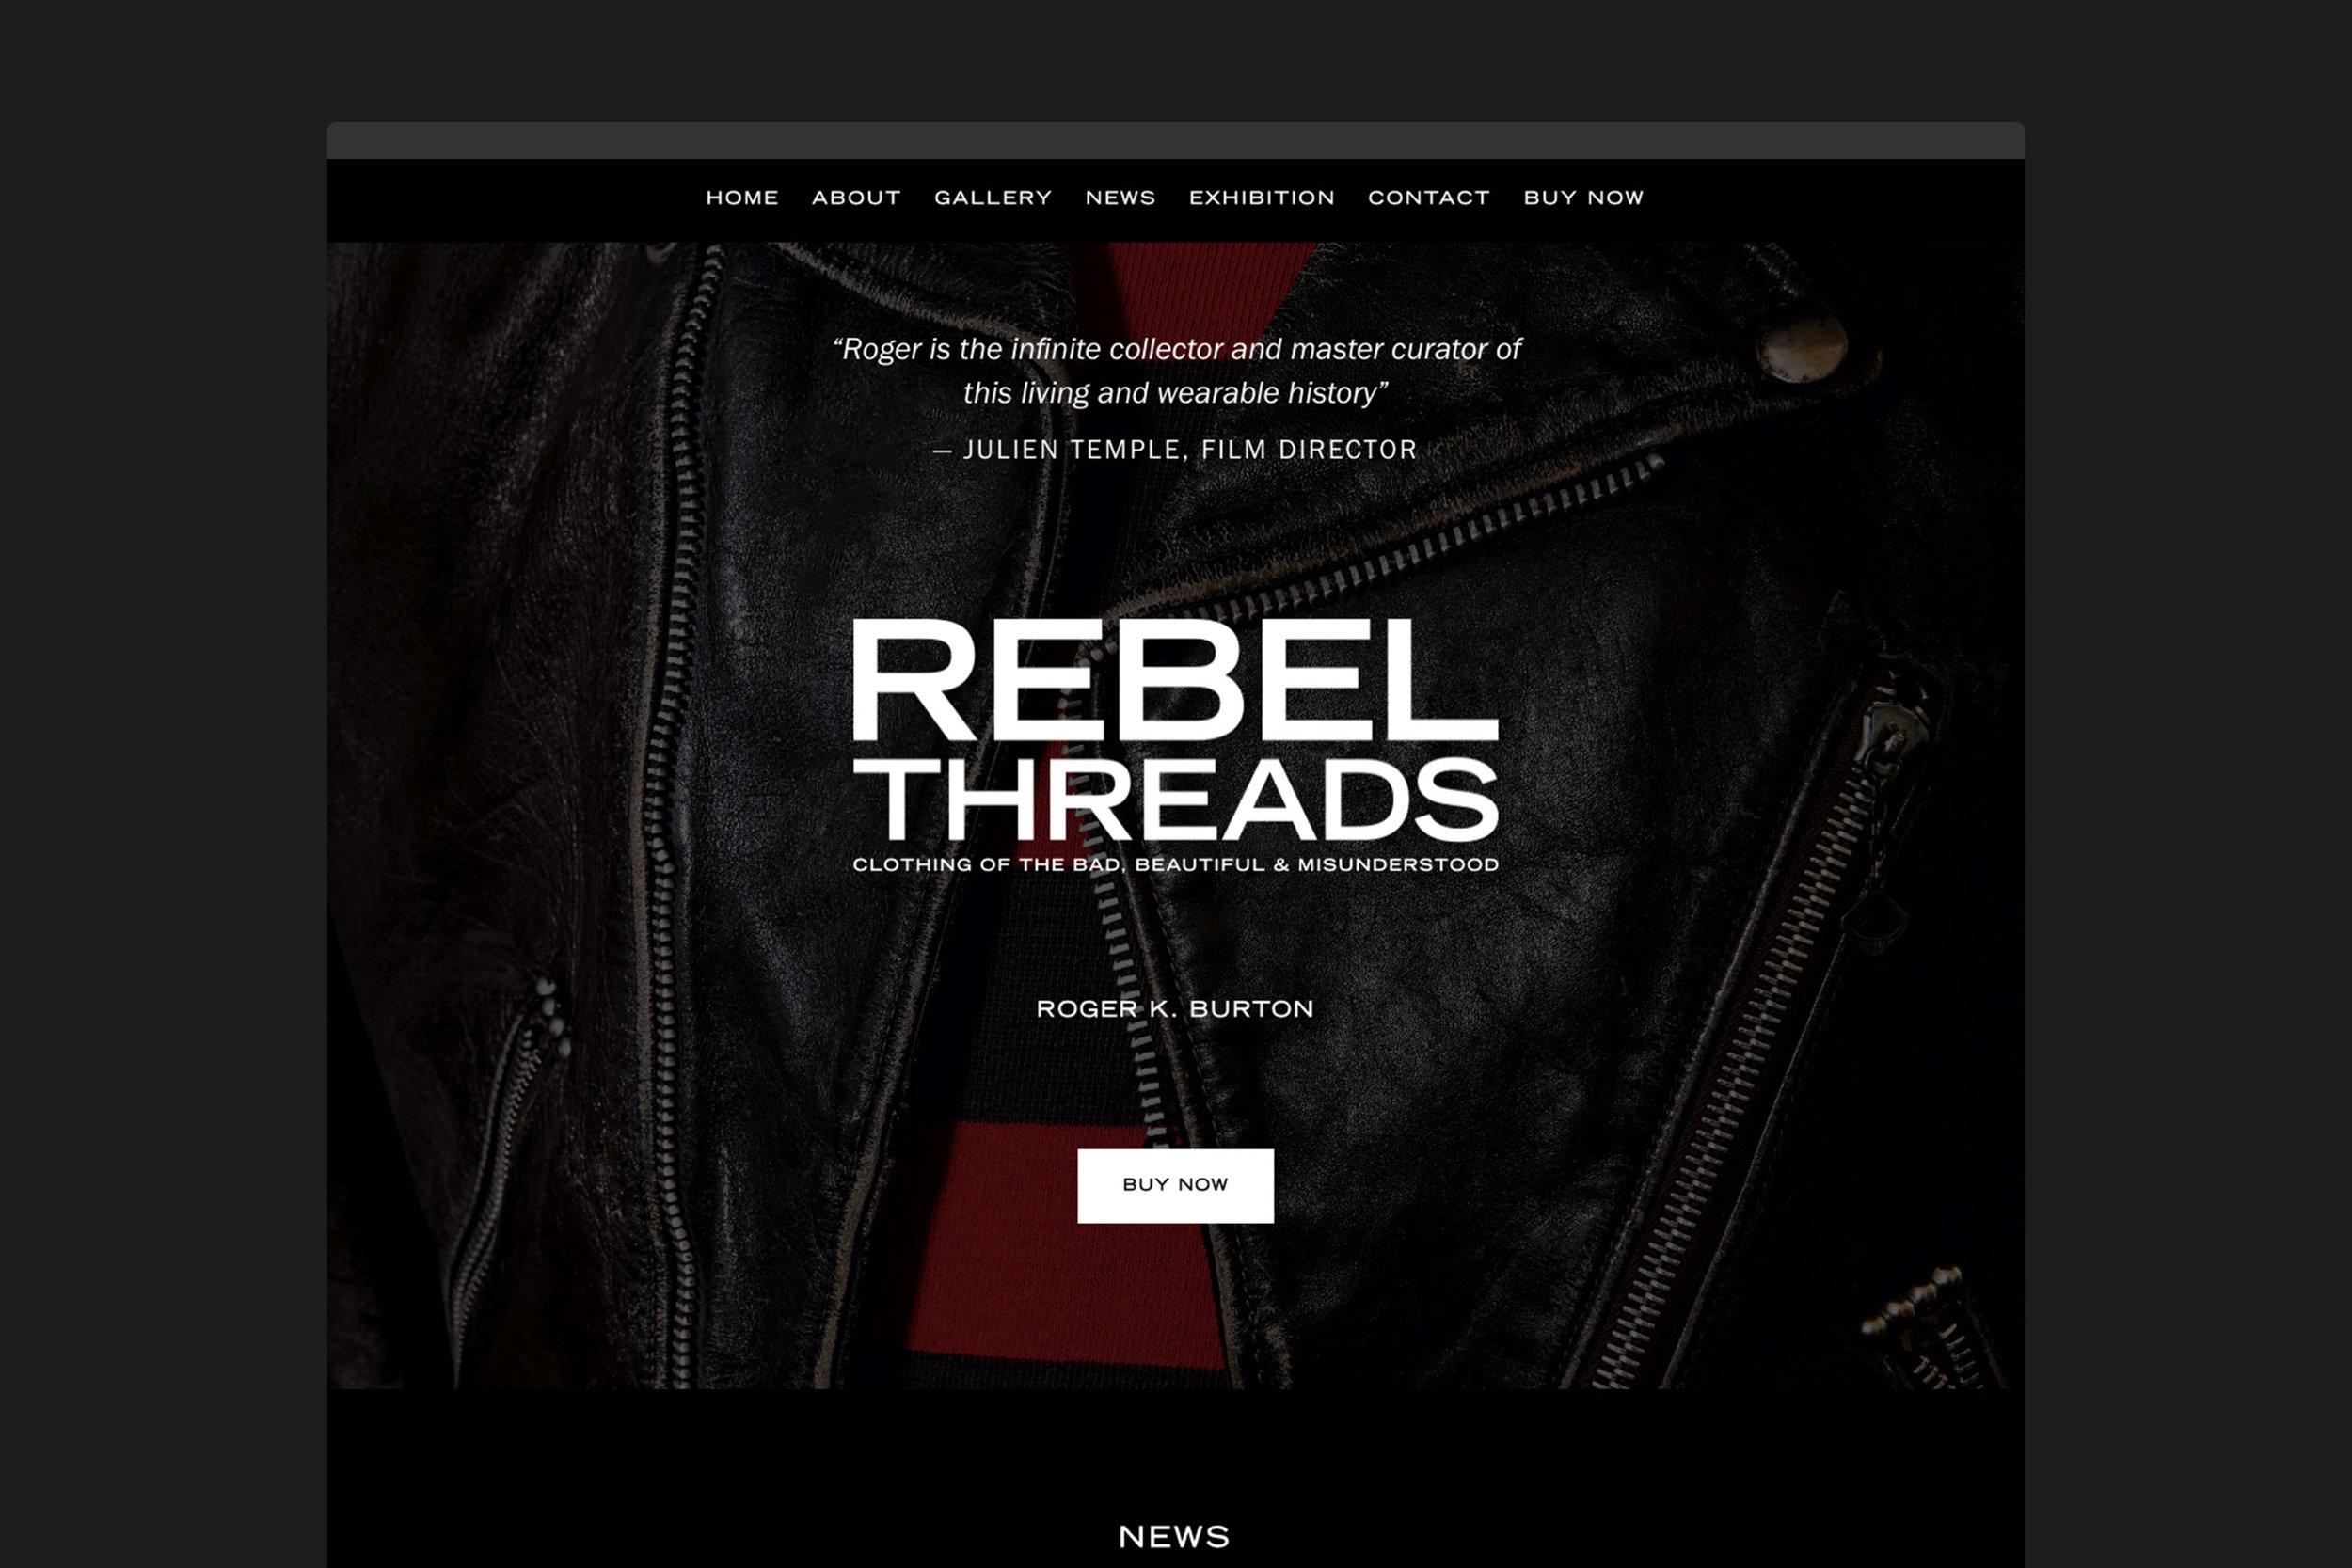 Rebel-Threads-Canvas-4.jpg